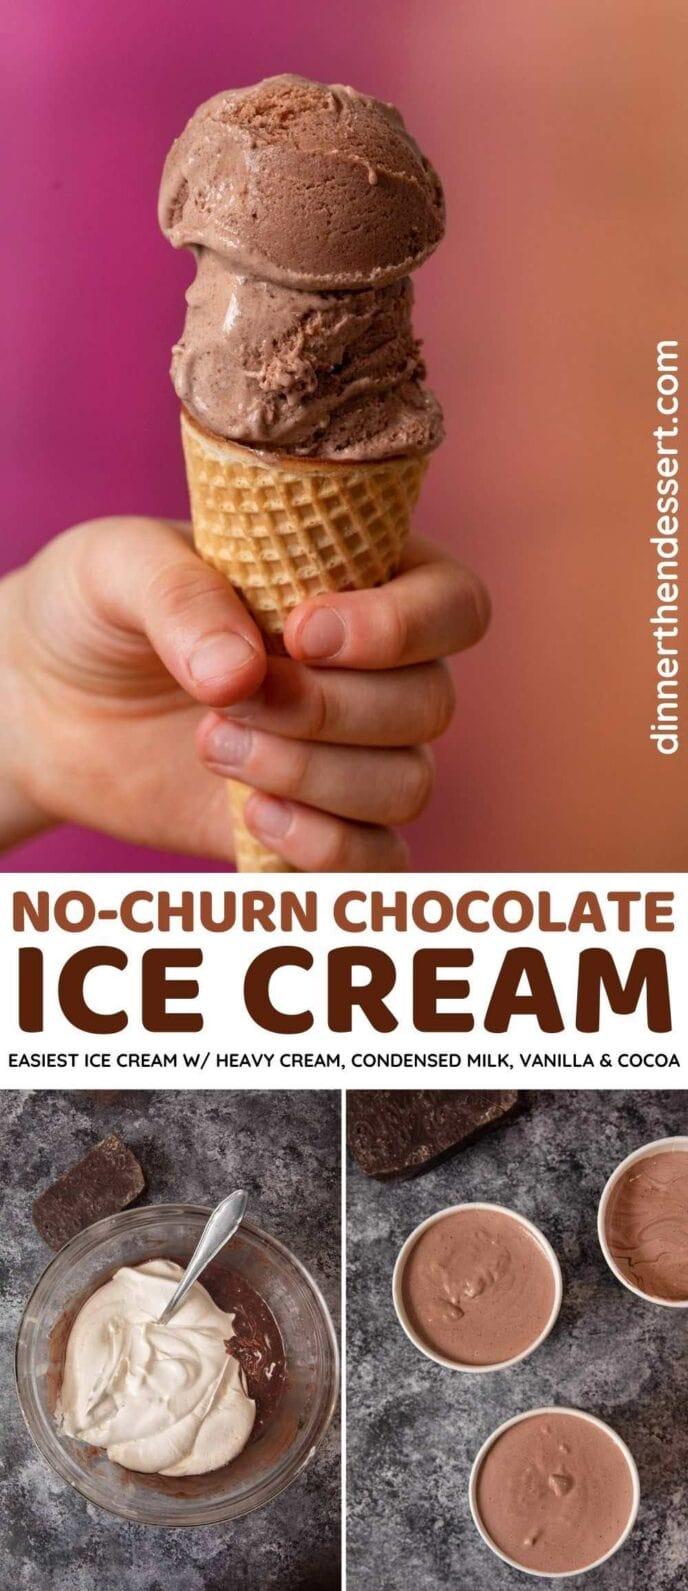 Creamy Chocolate Ice Cream collage